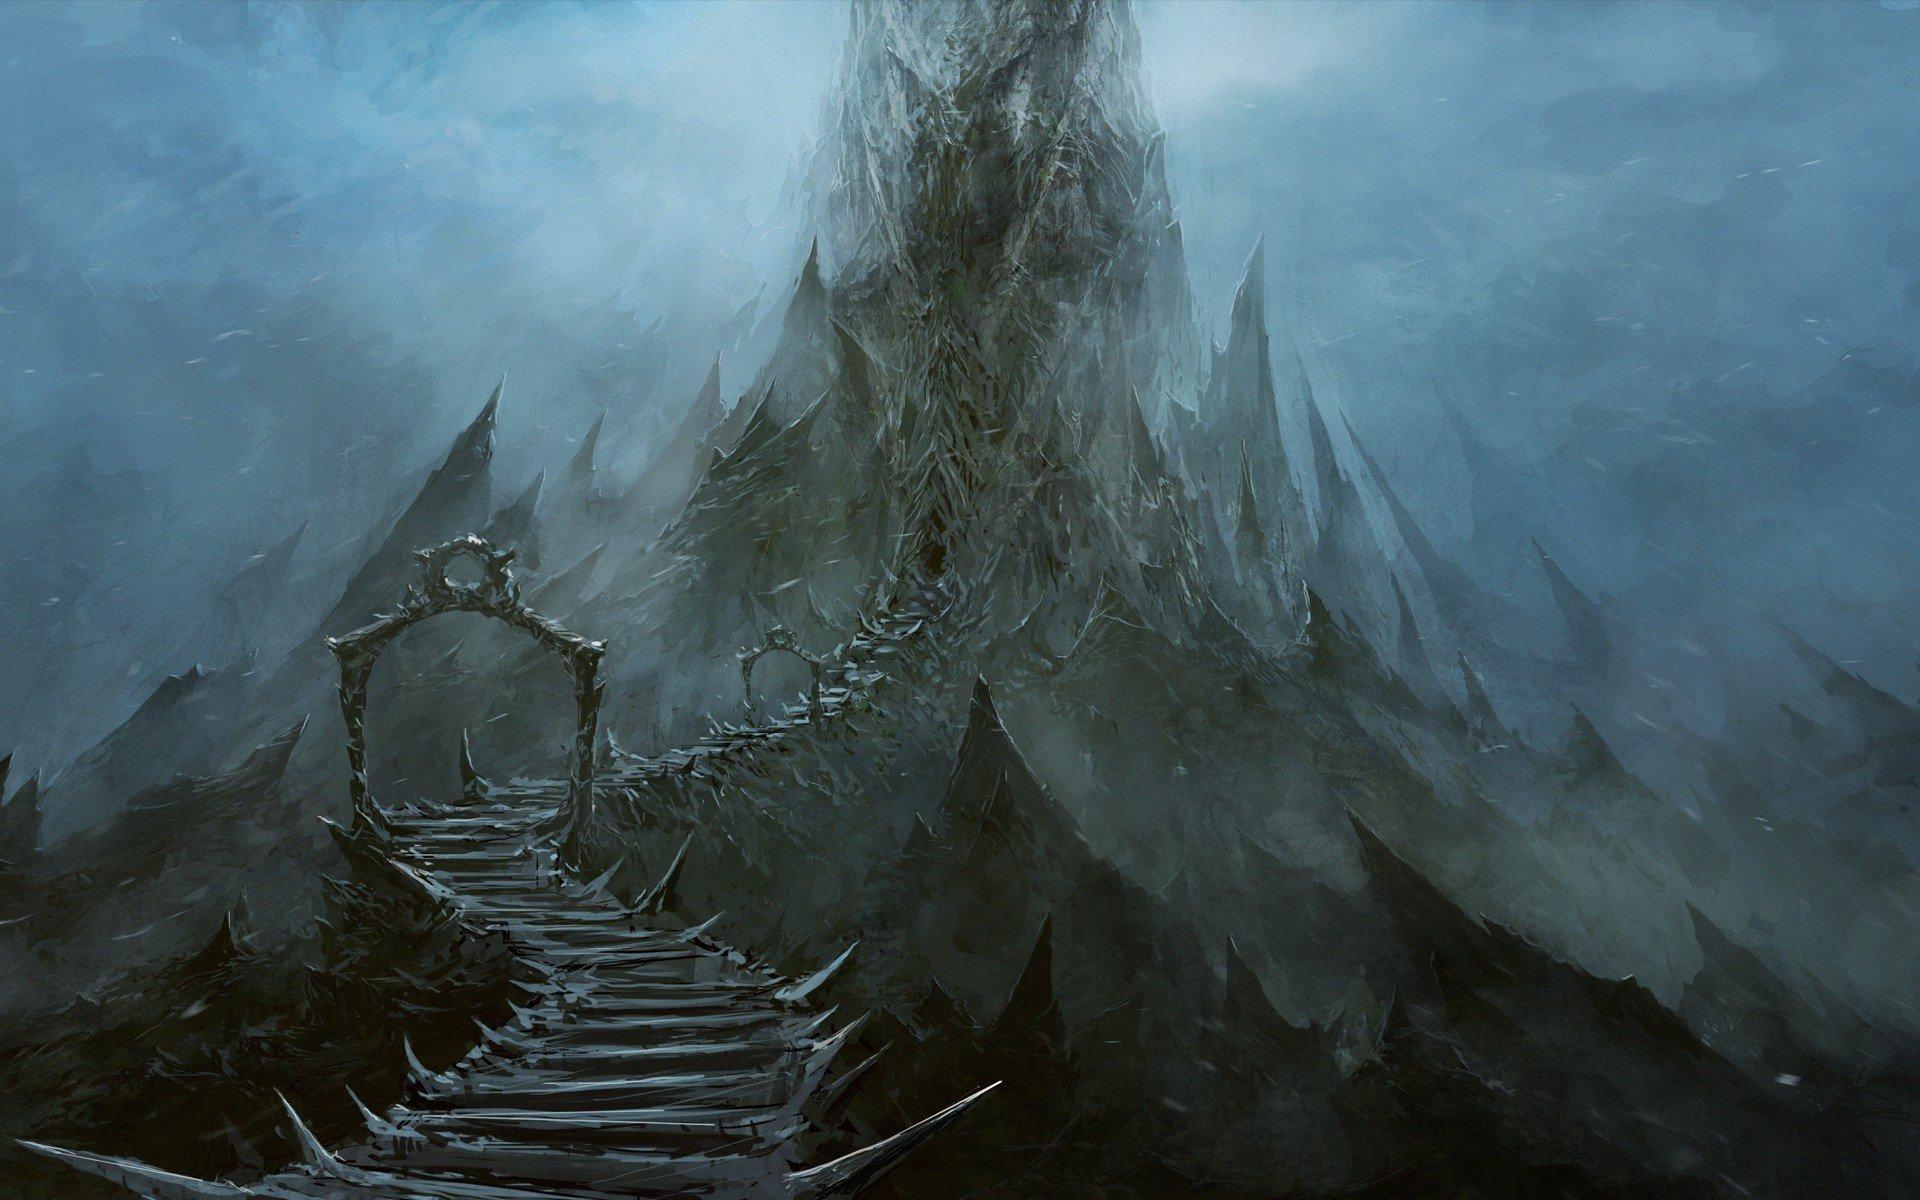 Fantasy Art Landscapes Mountains Mountains Landscapes Fantasy